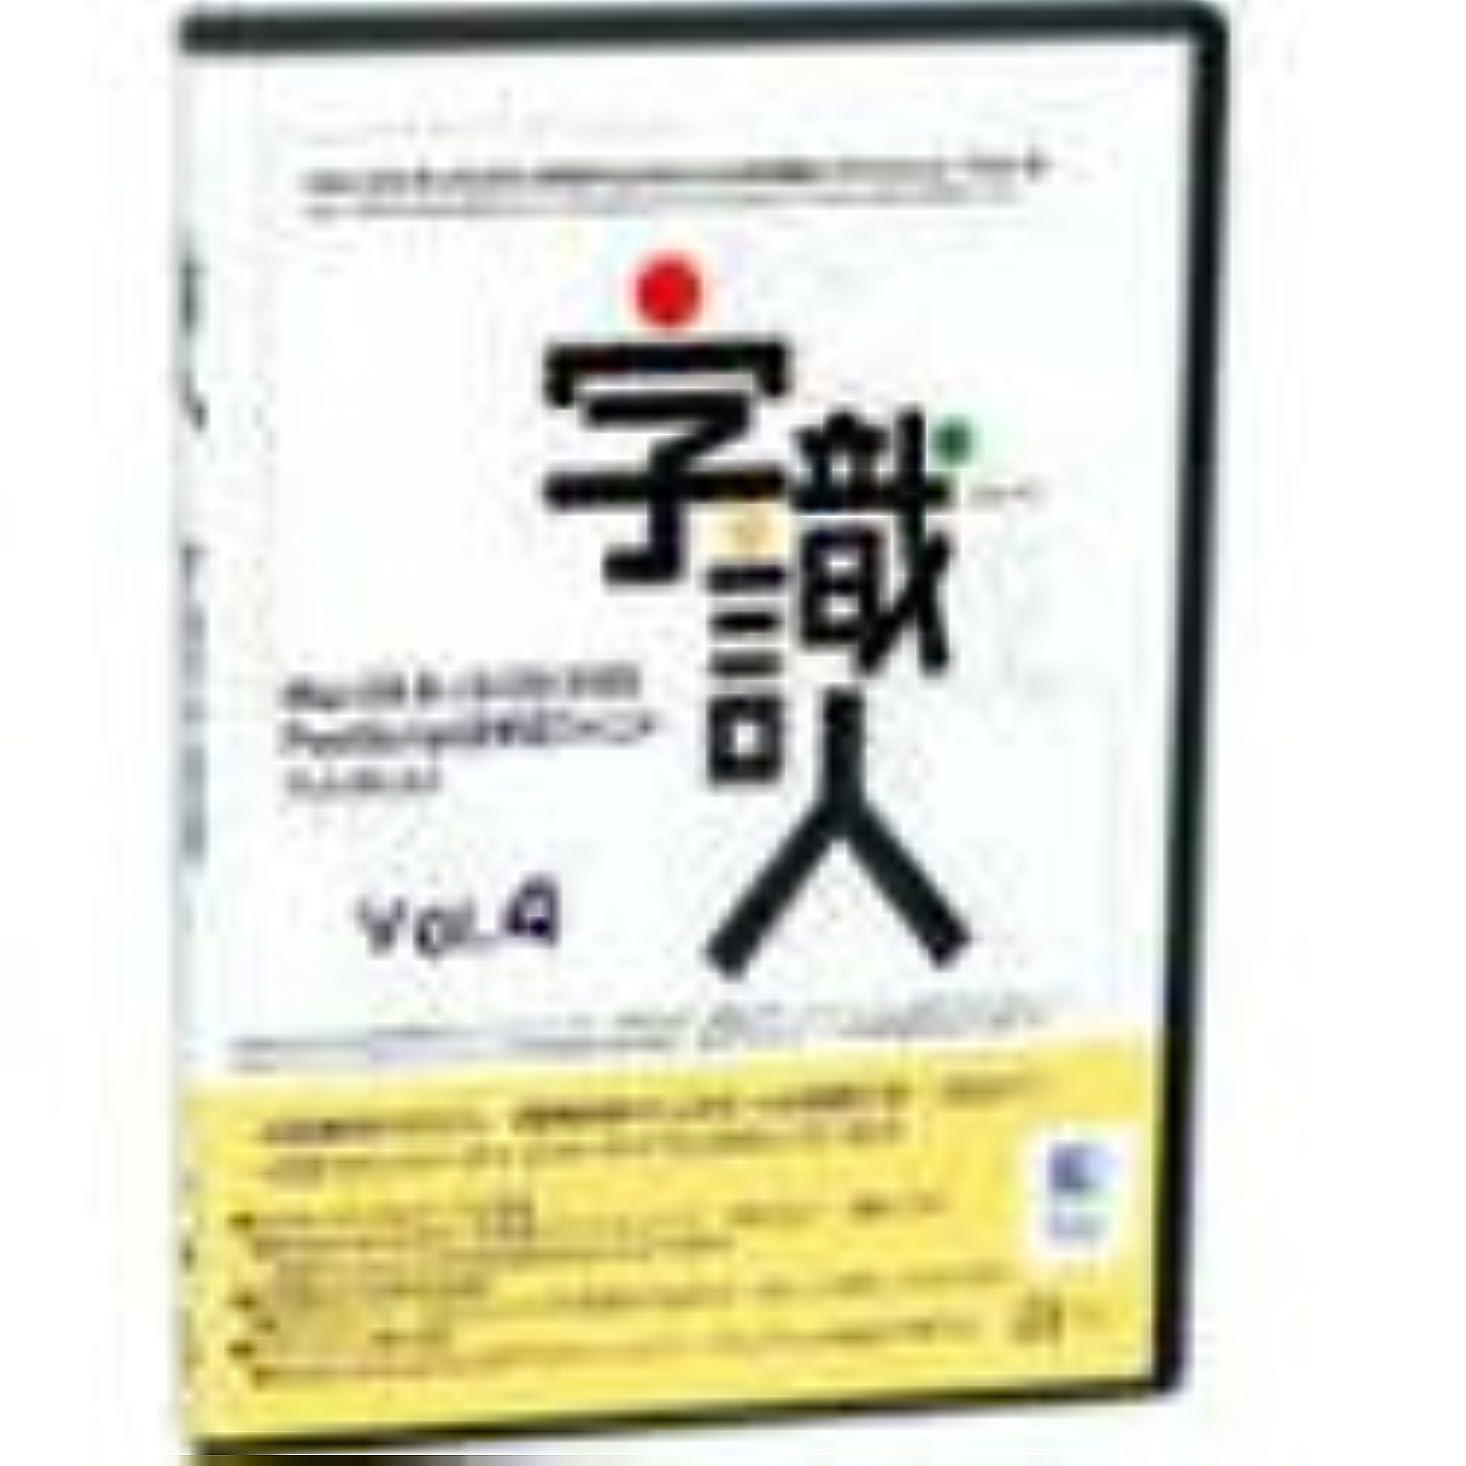 非公式無視病気の字識人 MacOS 8 & 9/OS X対応PostScript日本語ATMフォント Vol.4 1書体選択版